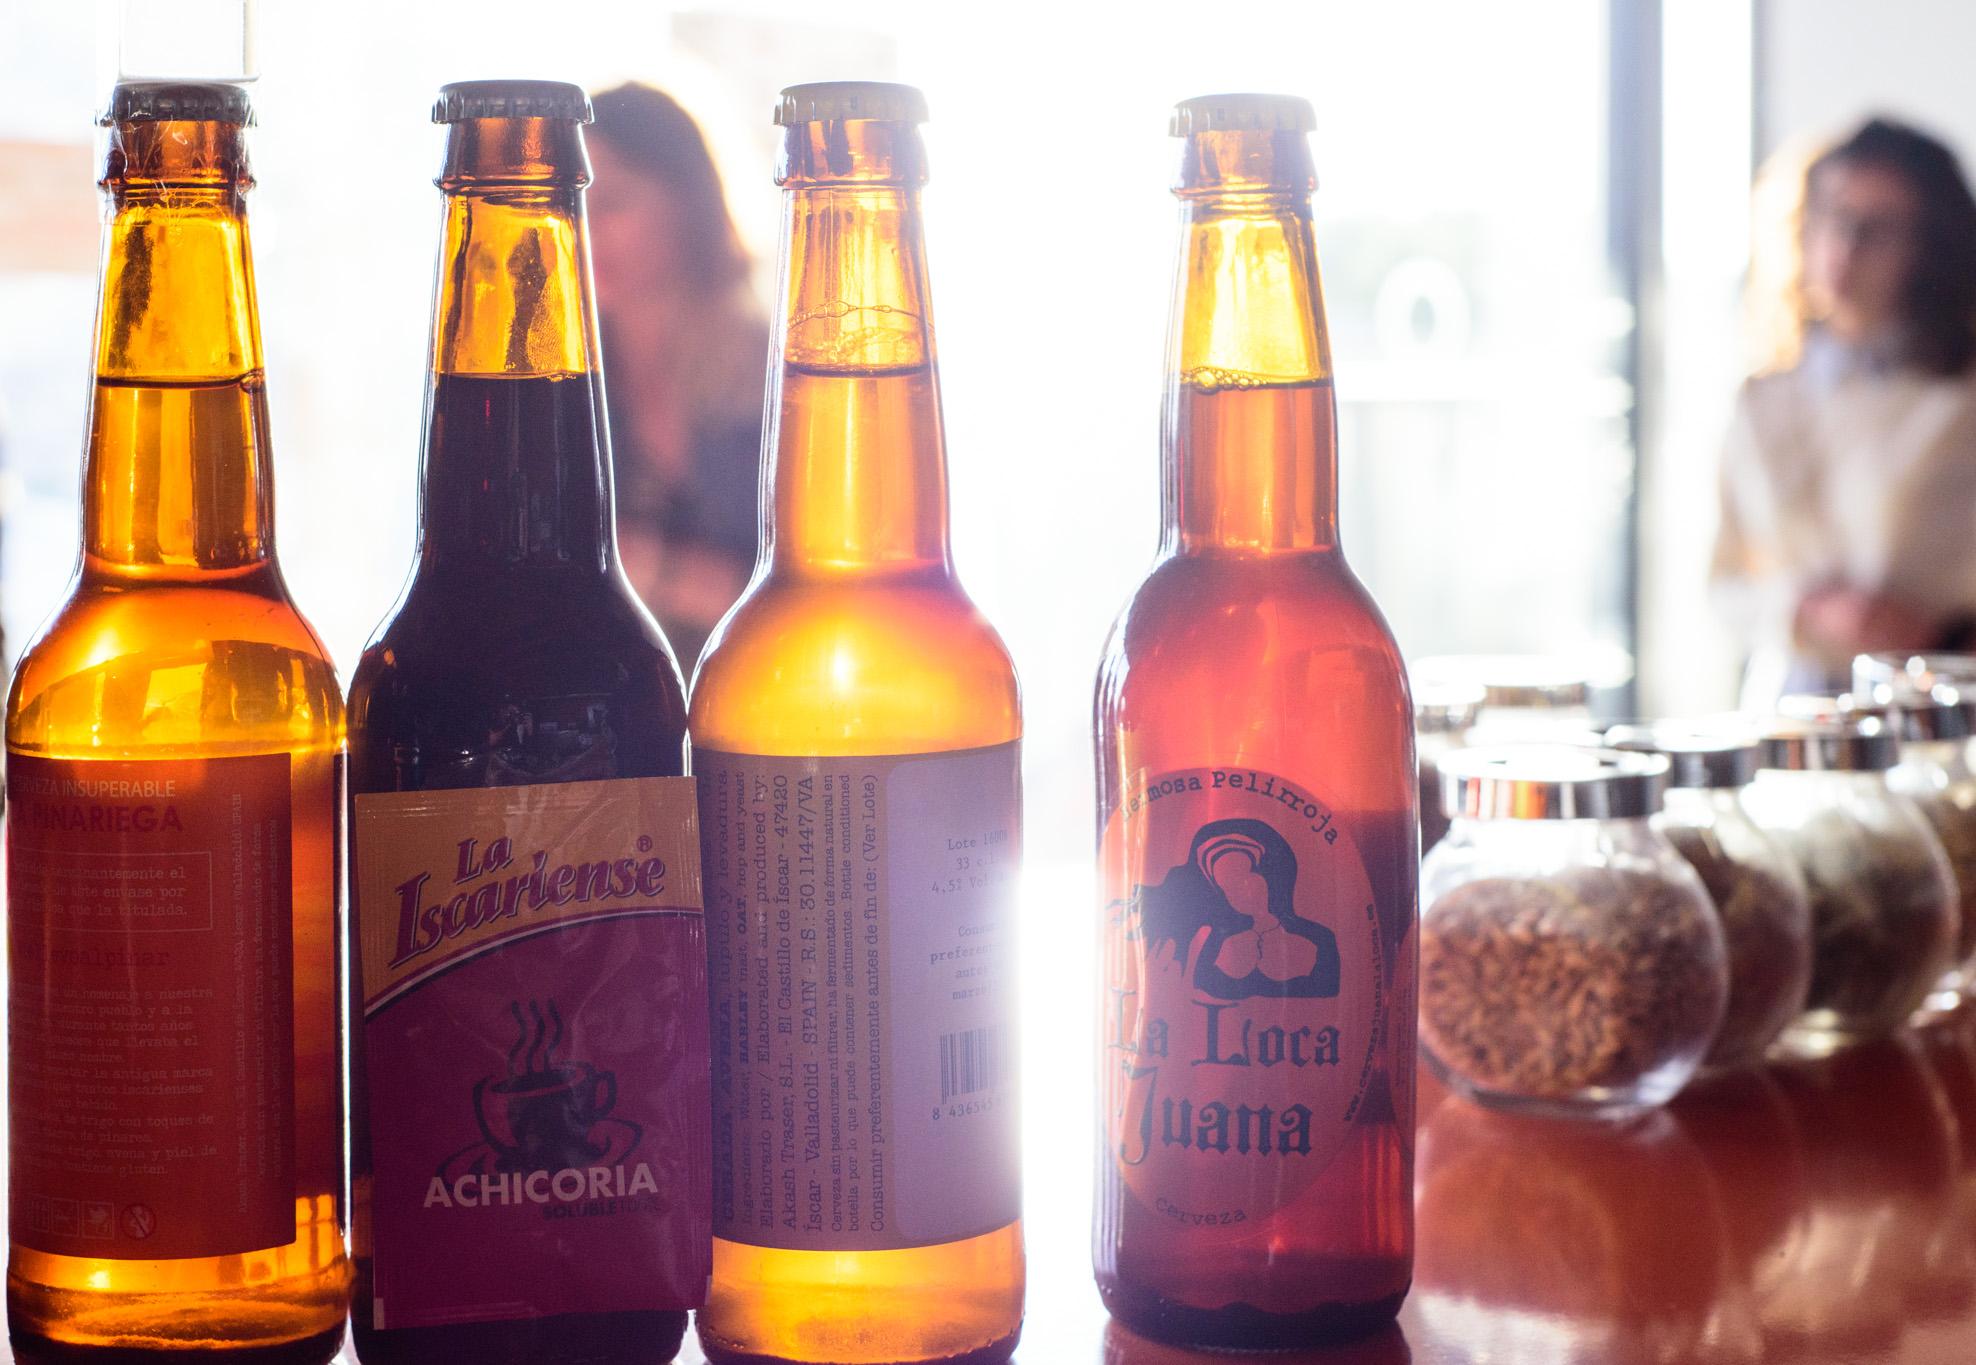 castillo-iscar-cervecera-artesana-la-loca-juana-25